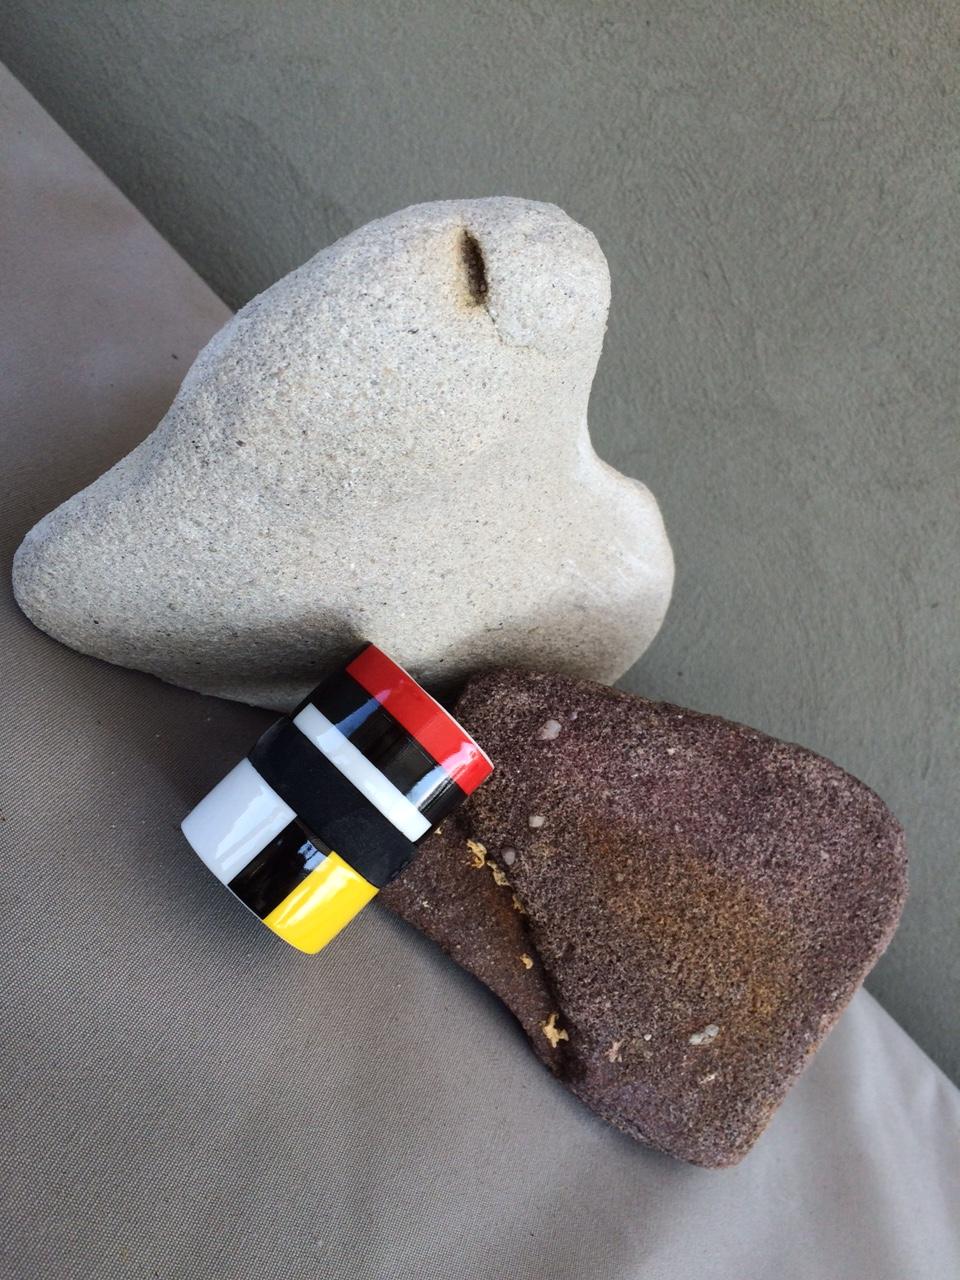 Two rocks and a Mondrain-like pattern